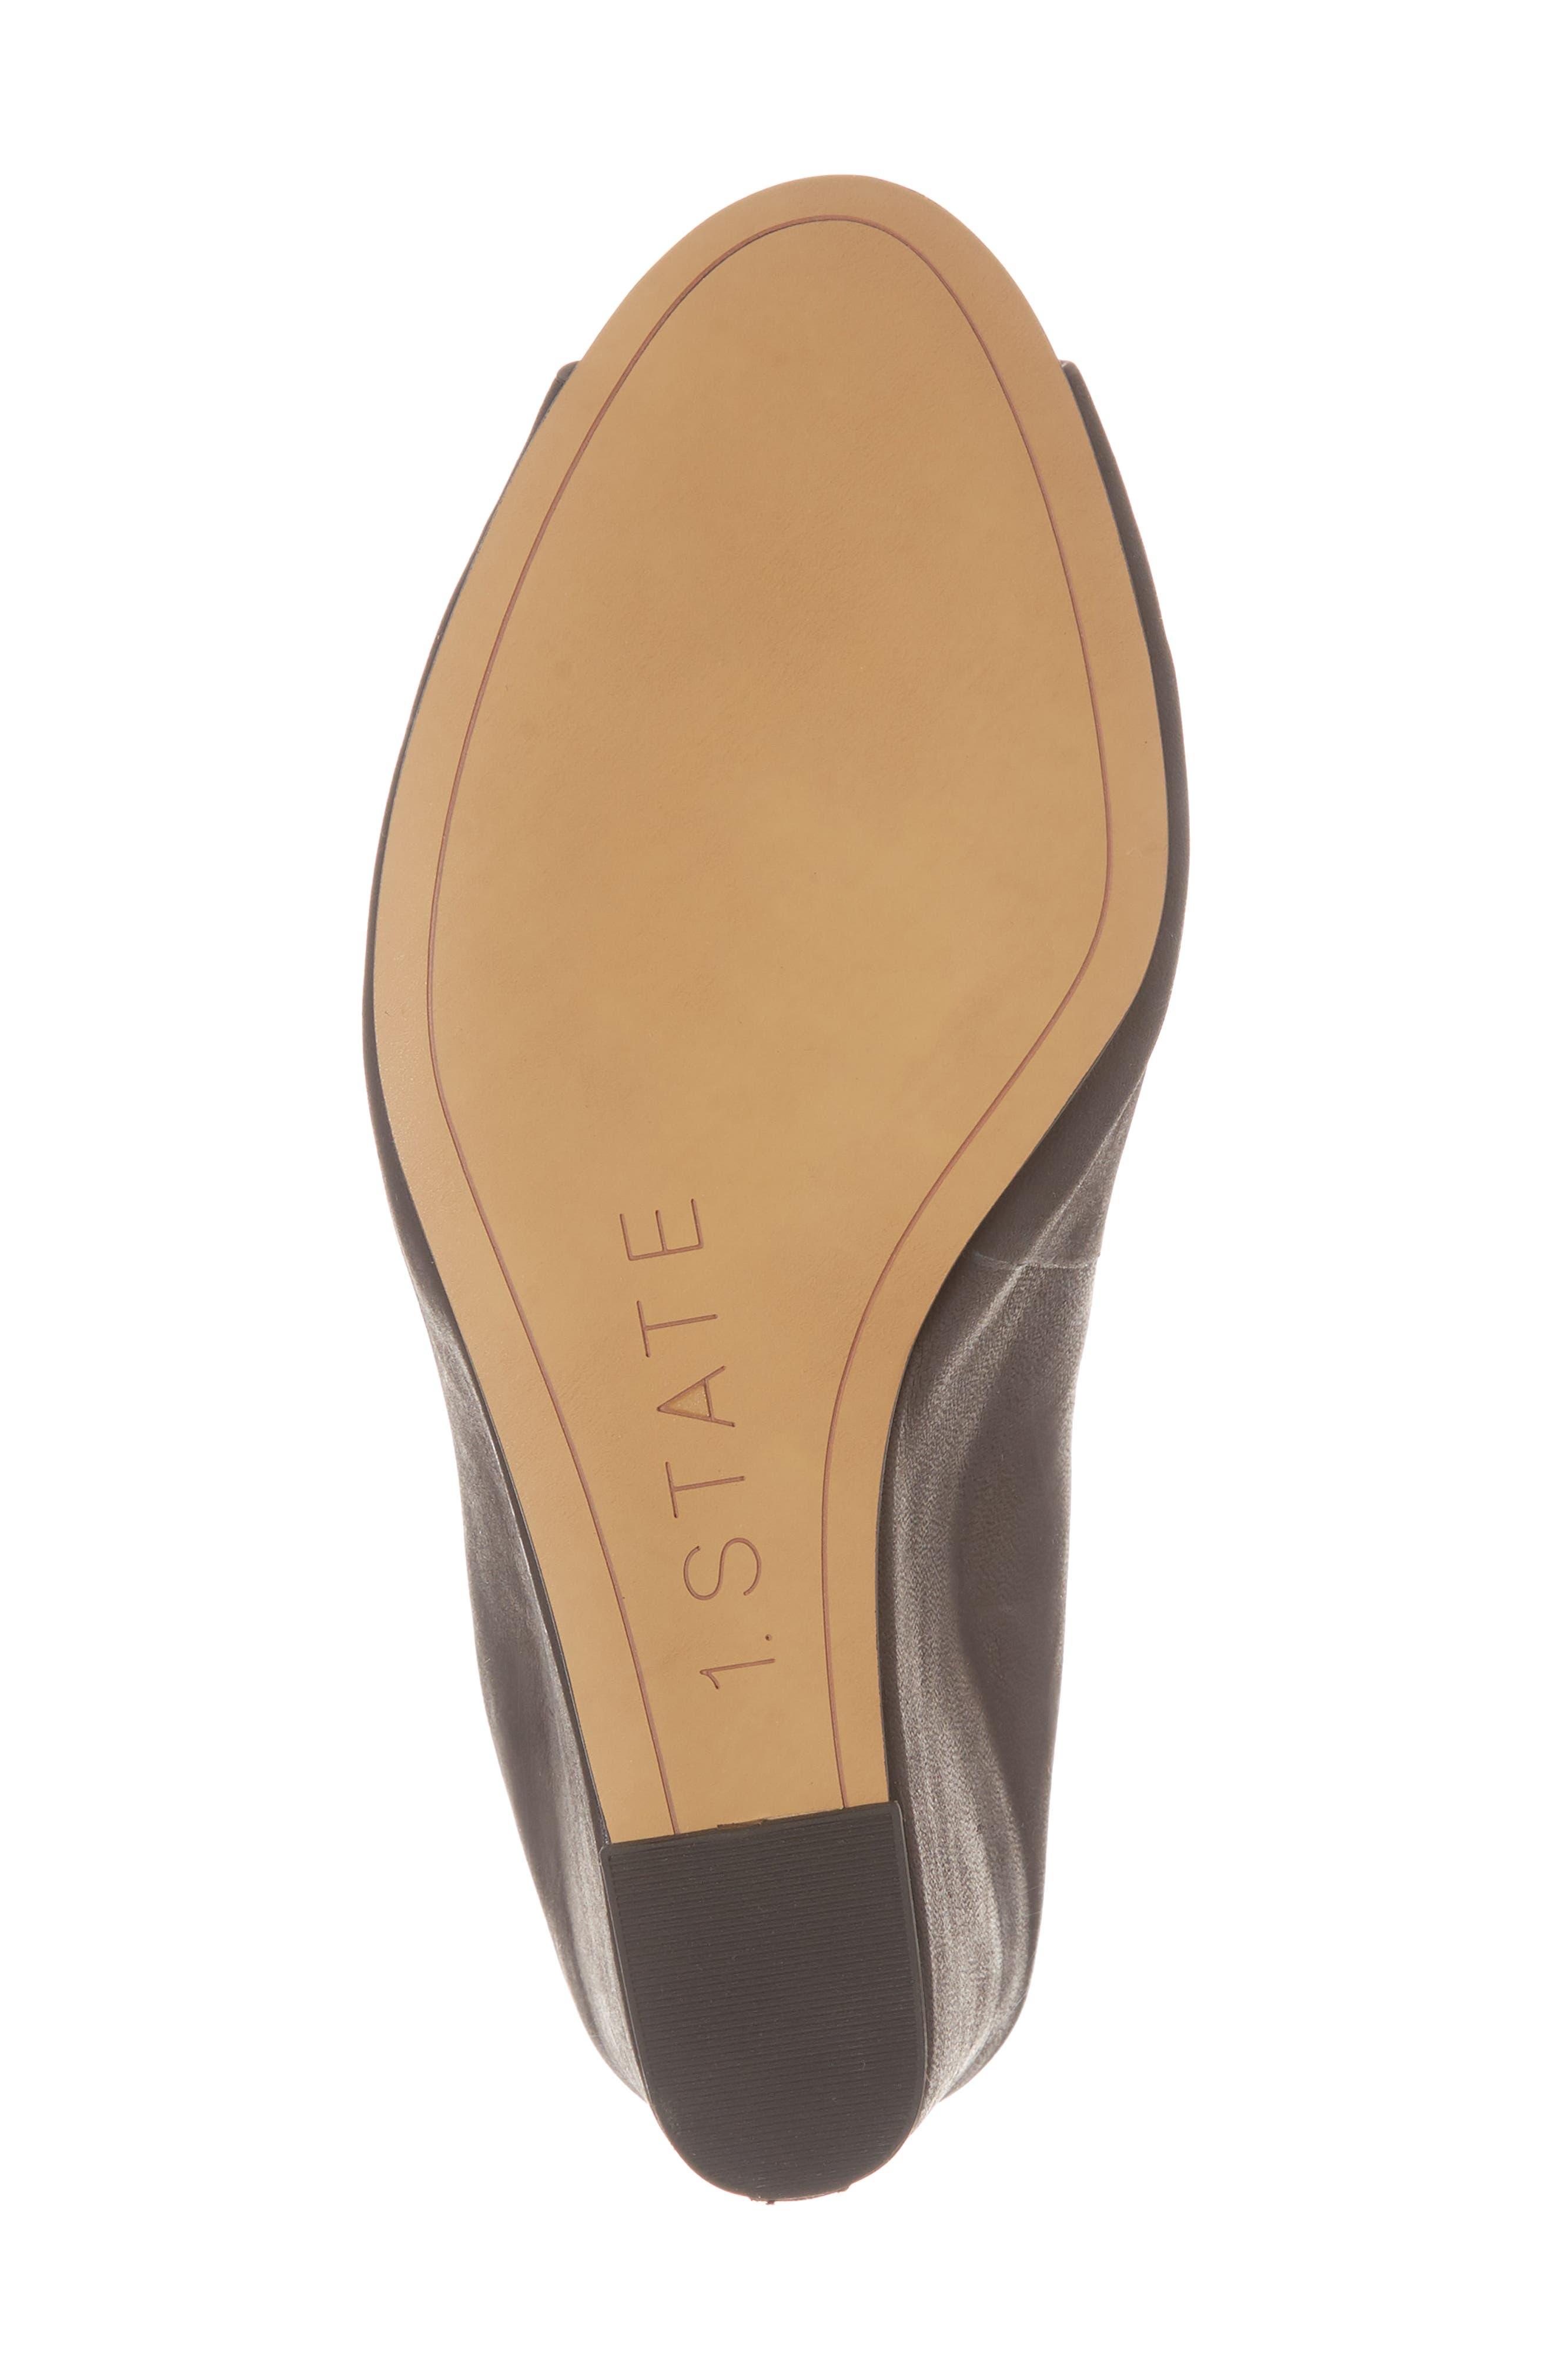 Felidia Wedge Sandal,                             Alternate thumbnail 6, color,                             Black Leather